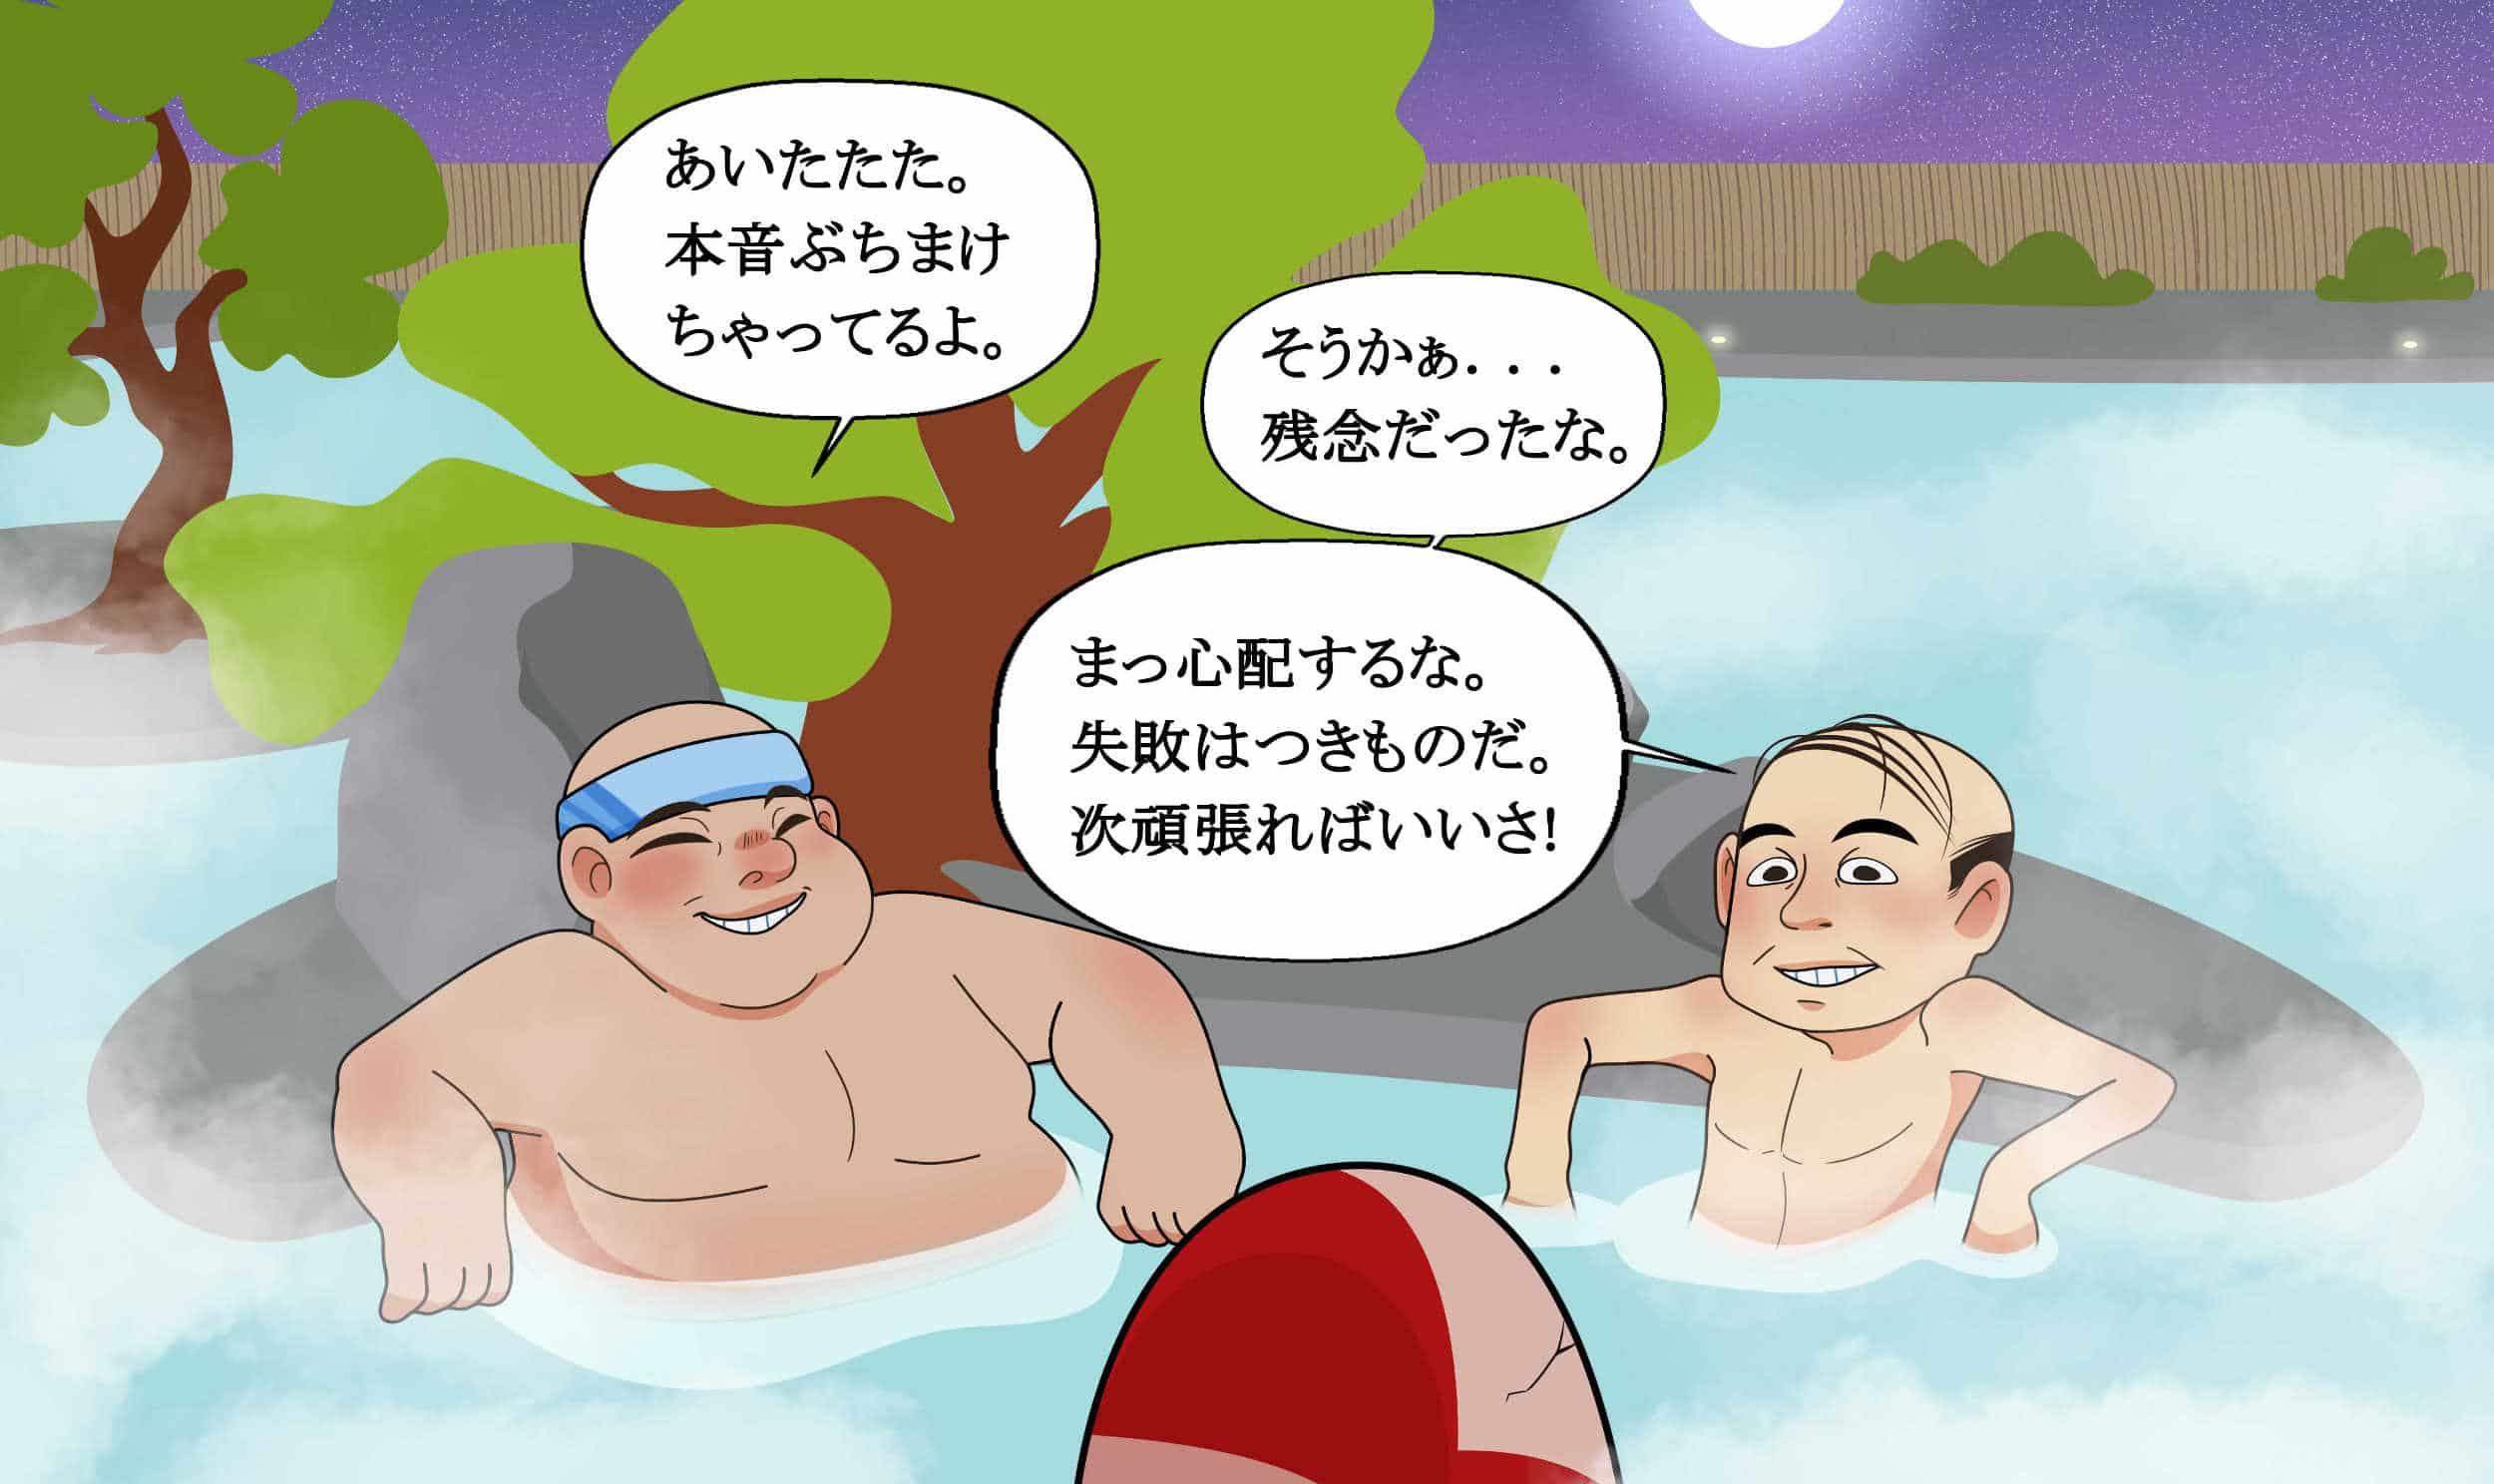 Onsen_22 (repeat)-min.jpg